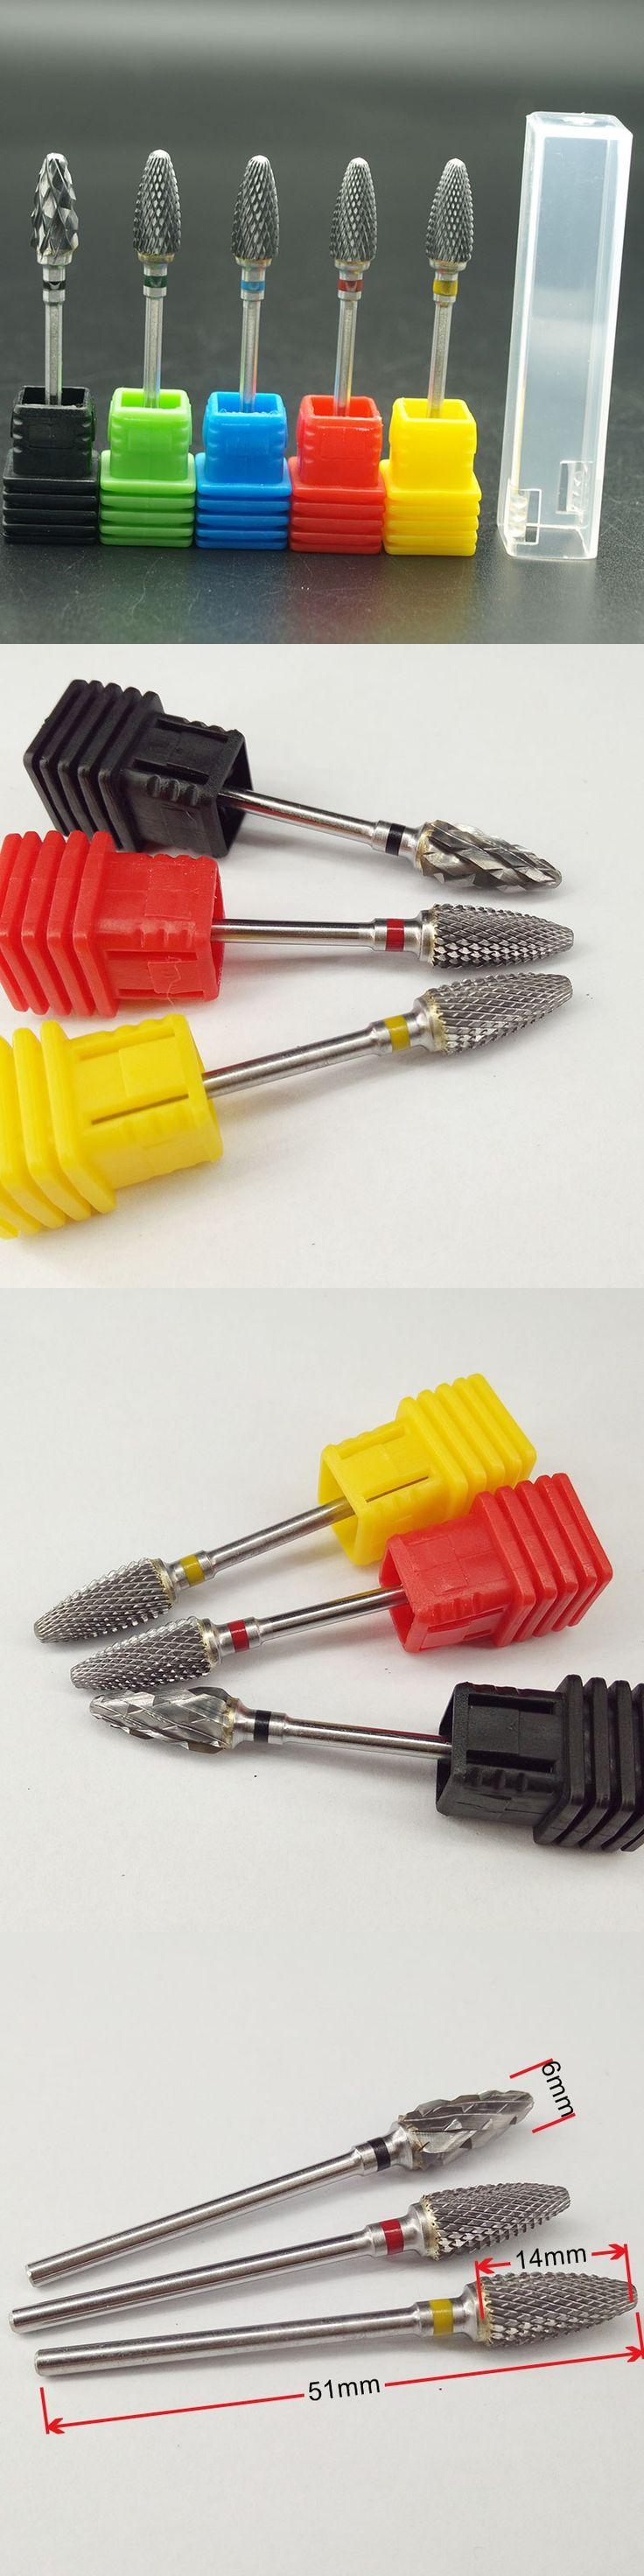 Hot 51mm Design 6.0 Flame Bit Shape Carbide Nail Drill Bit Electric Nail File Drill Bit Coarse Carbide Drill Nail Art Tool,3 siz